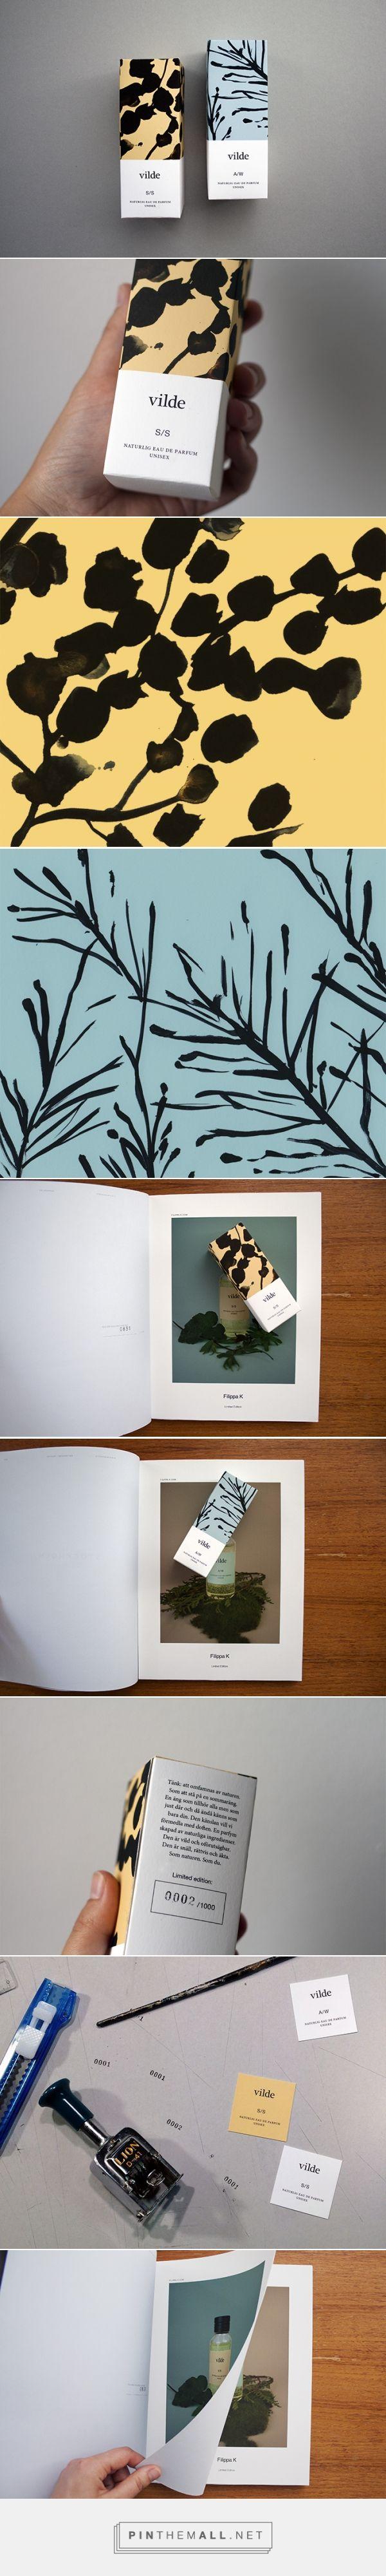 Vilde | Linda Hurtig